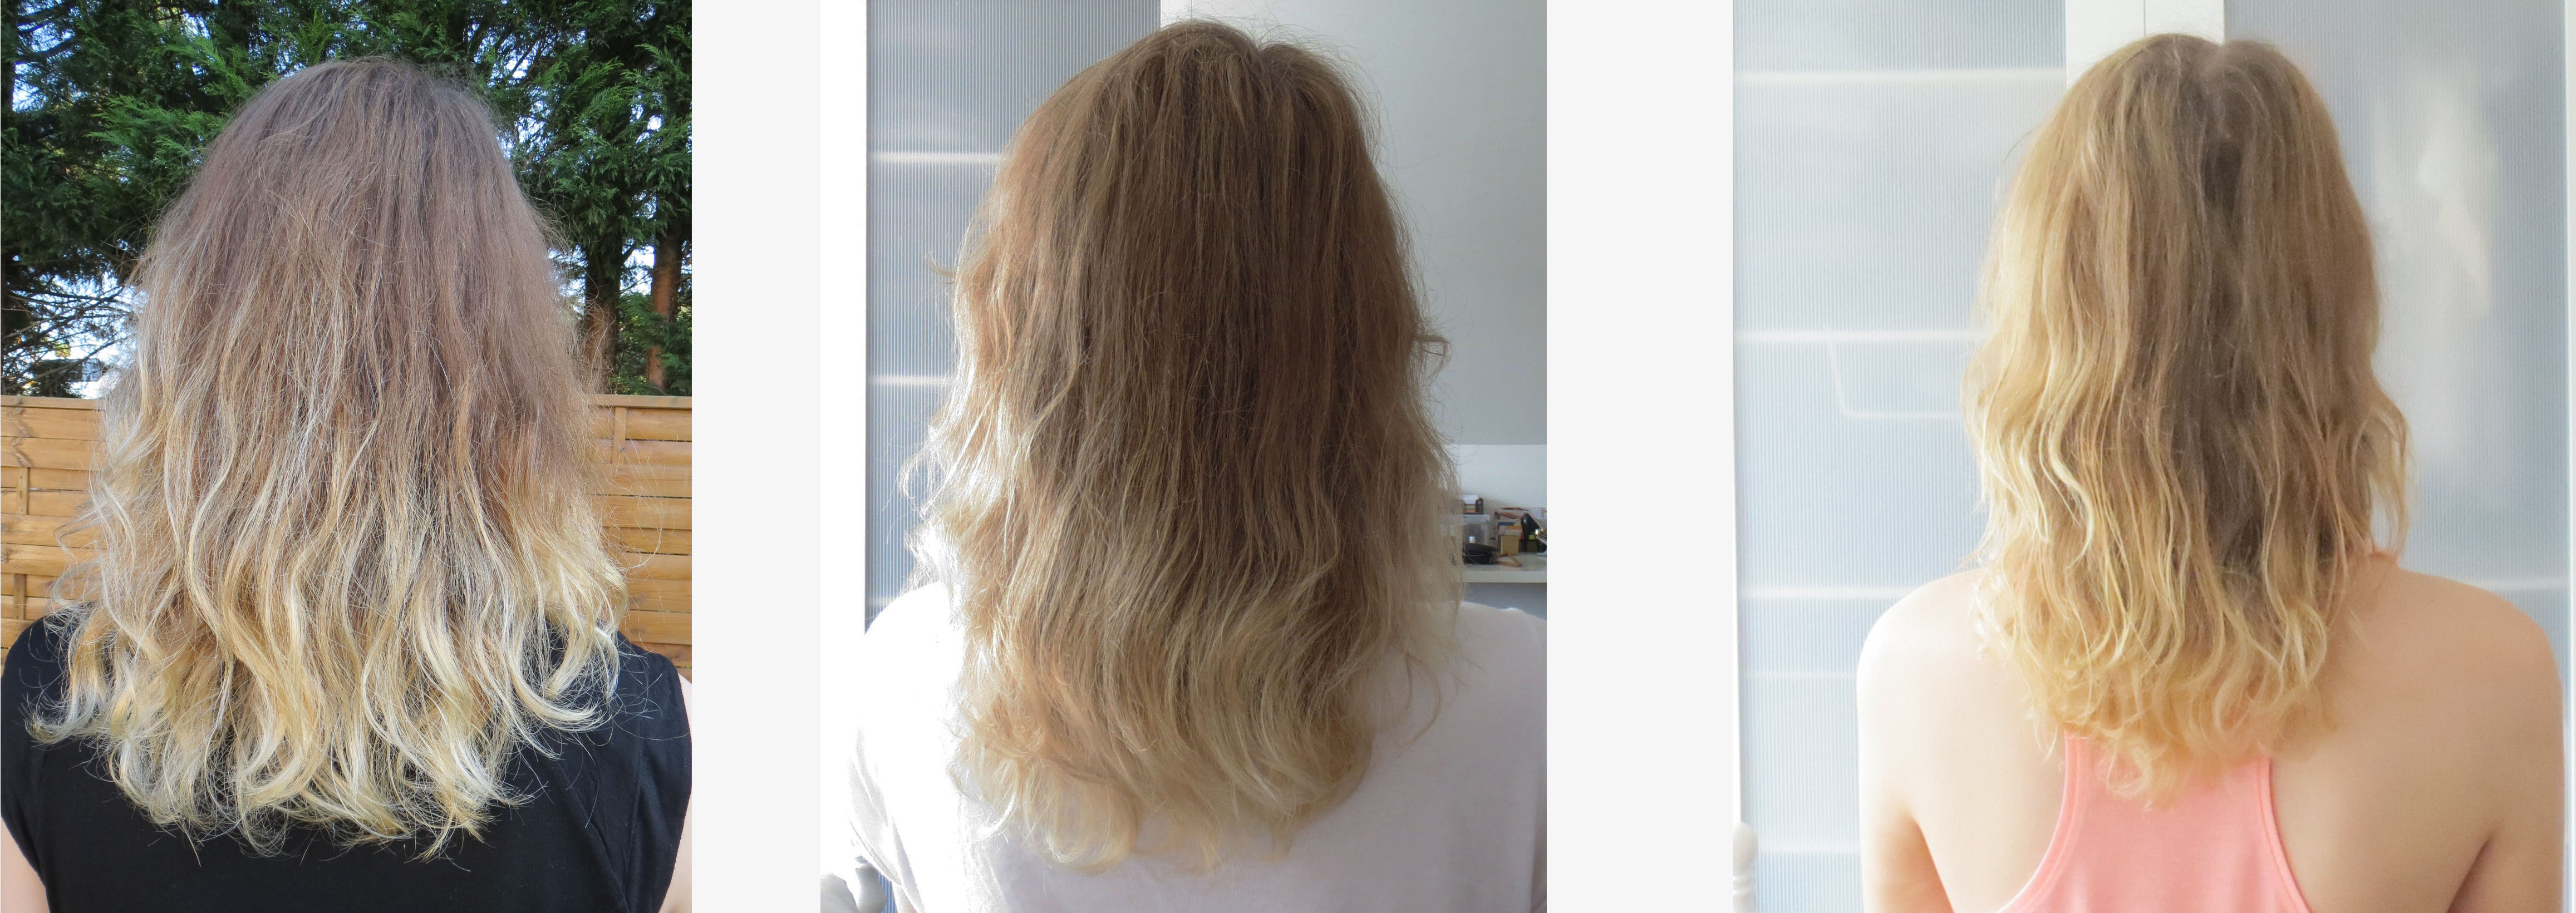 evolution capillaire - Shampoing Cheveux Colors Sans Silicone